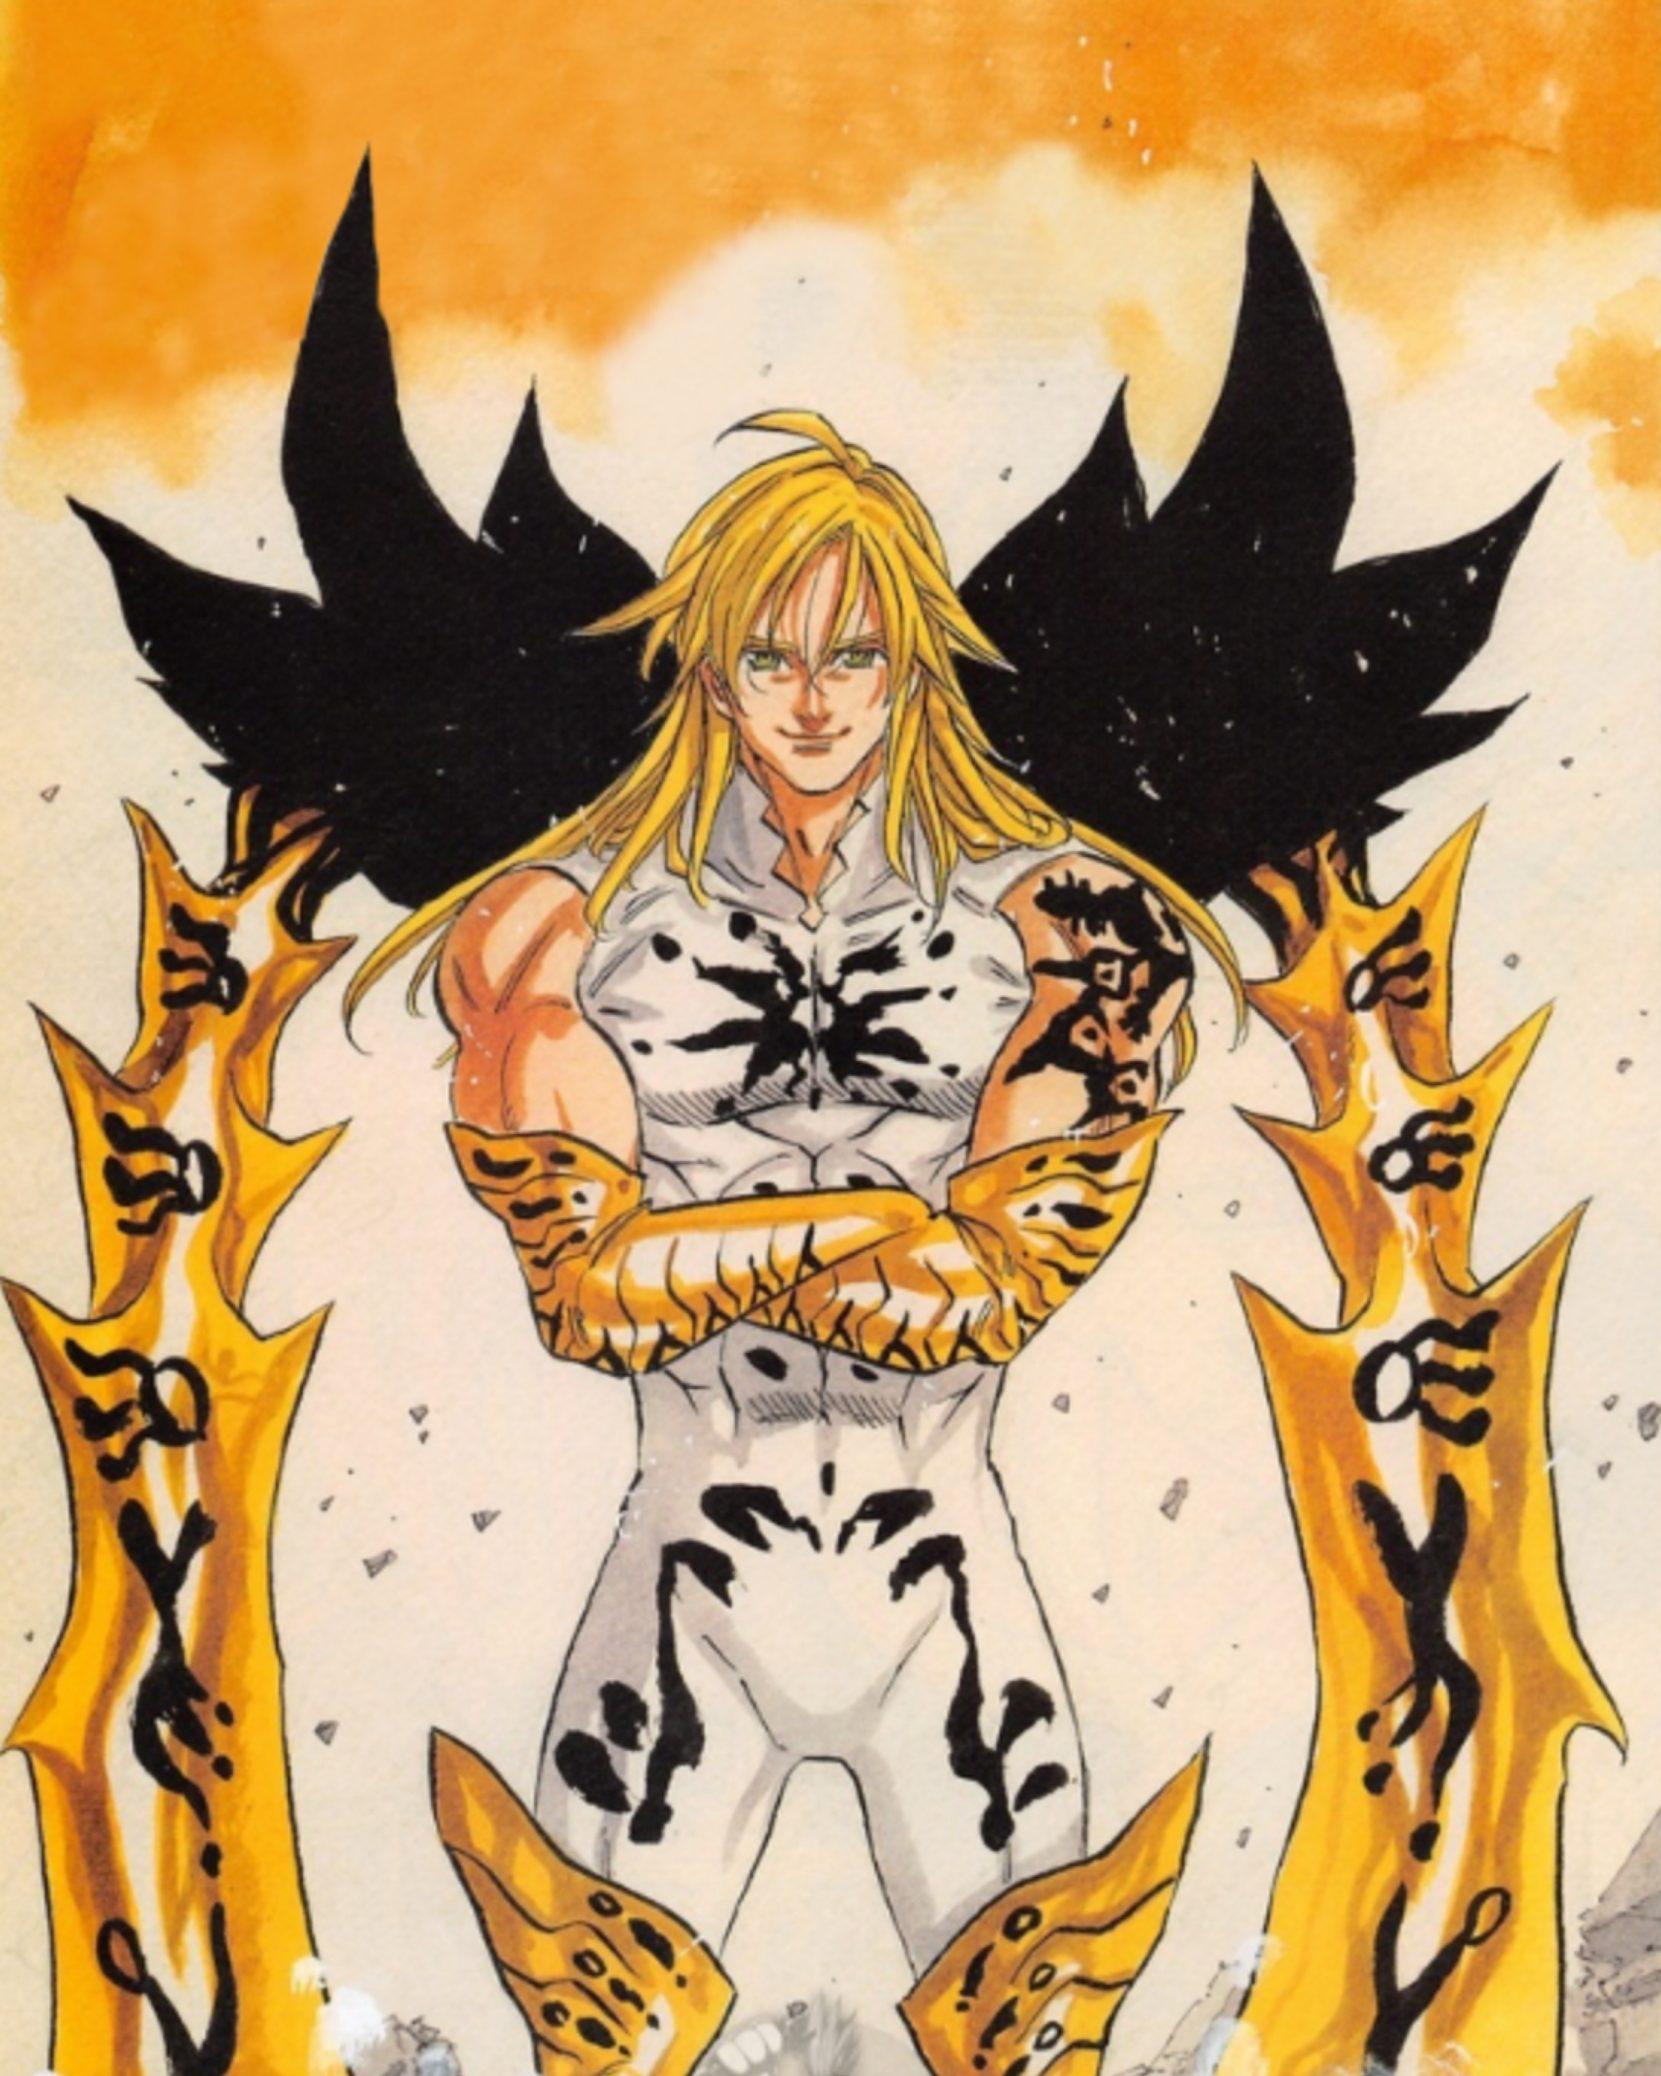 The Demon King: Seven Deadly Sins Ending